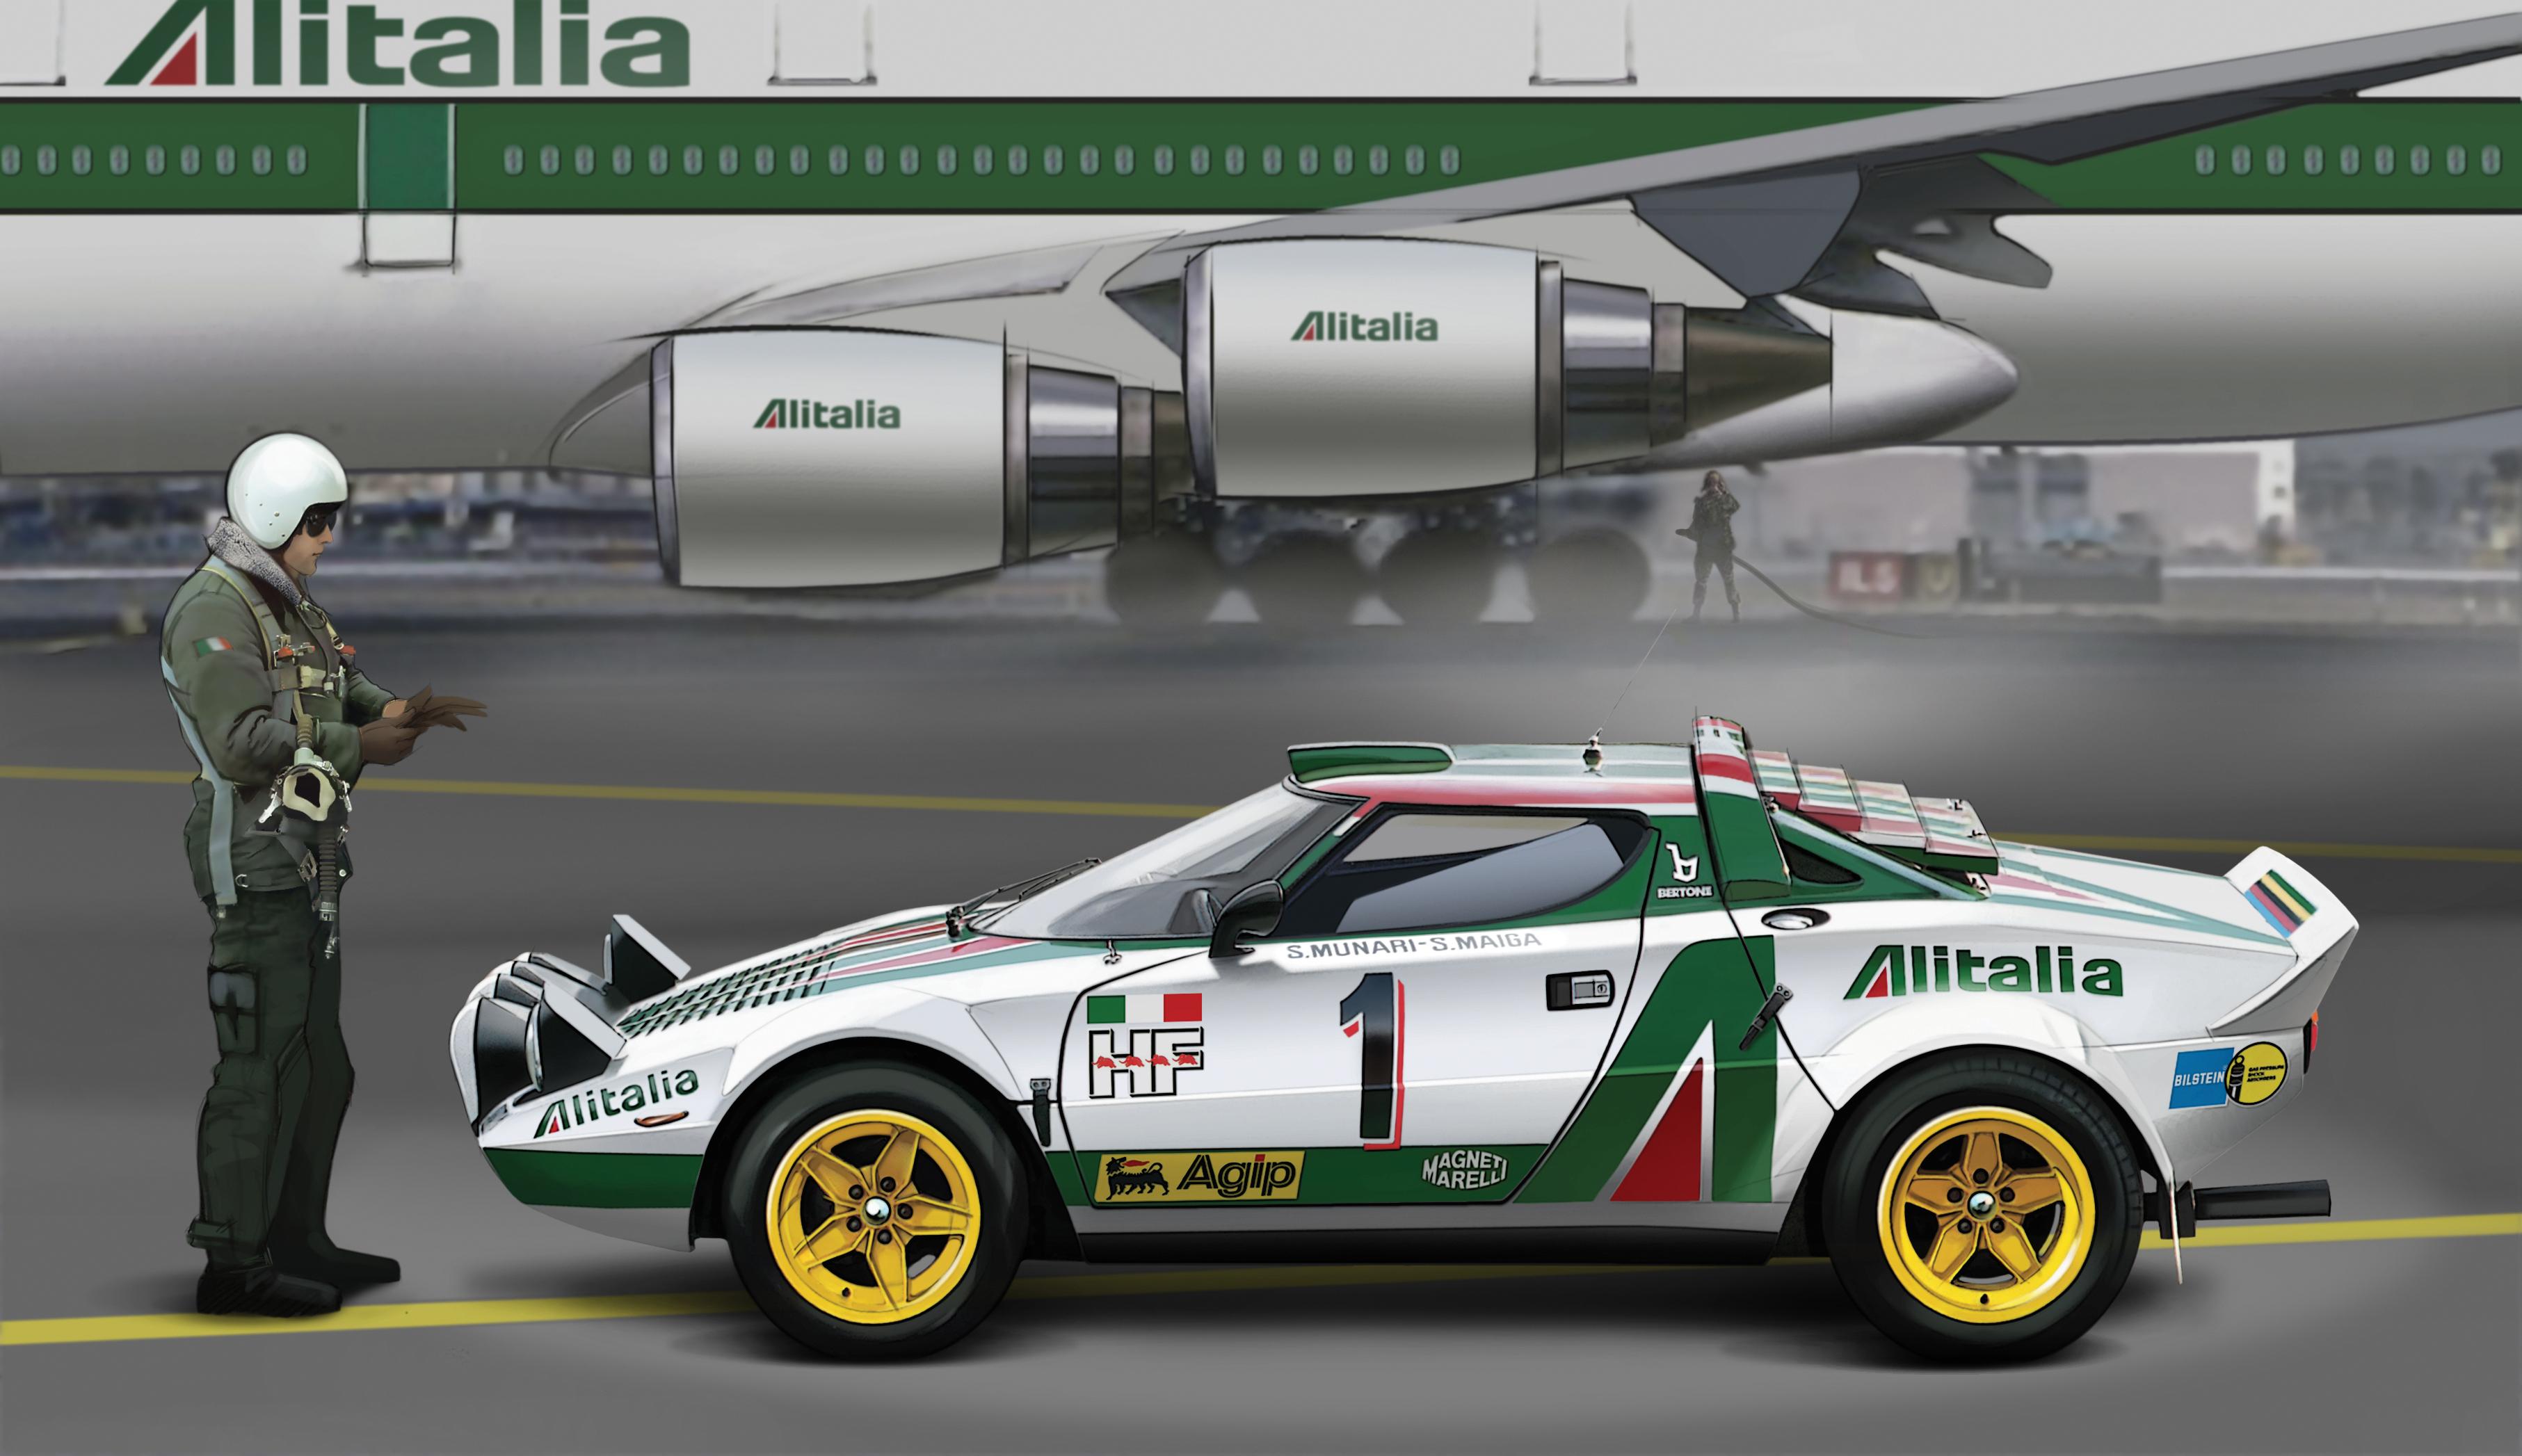 65 Alfa Romeo Giulia Tz 2 besides Alfa Romeo B A T 9 1955 together with File 1969 Alfa Romeo 1750 GTV pic4 together with Illustrations also Gassers. on alfa romeo bat 7